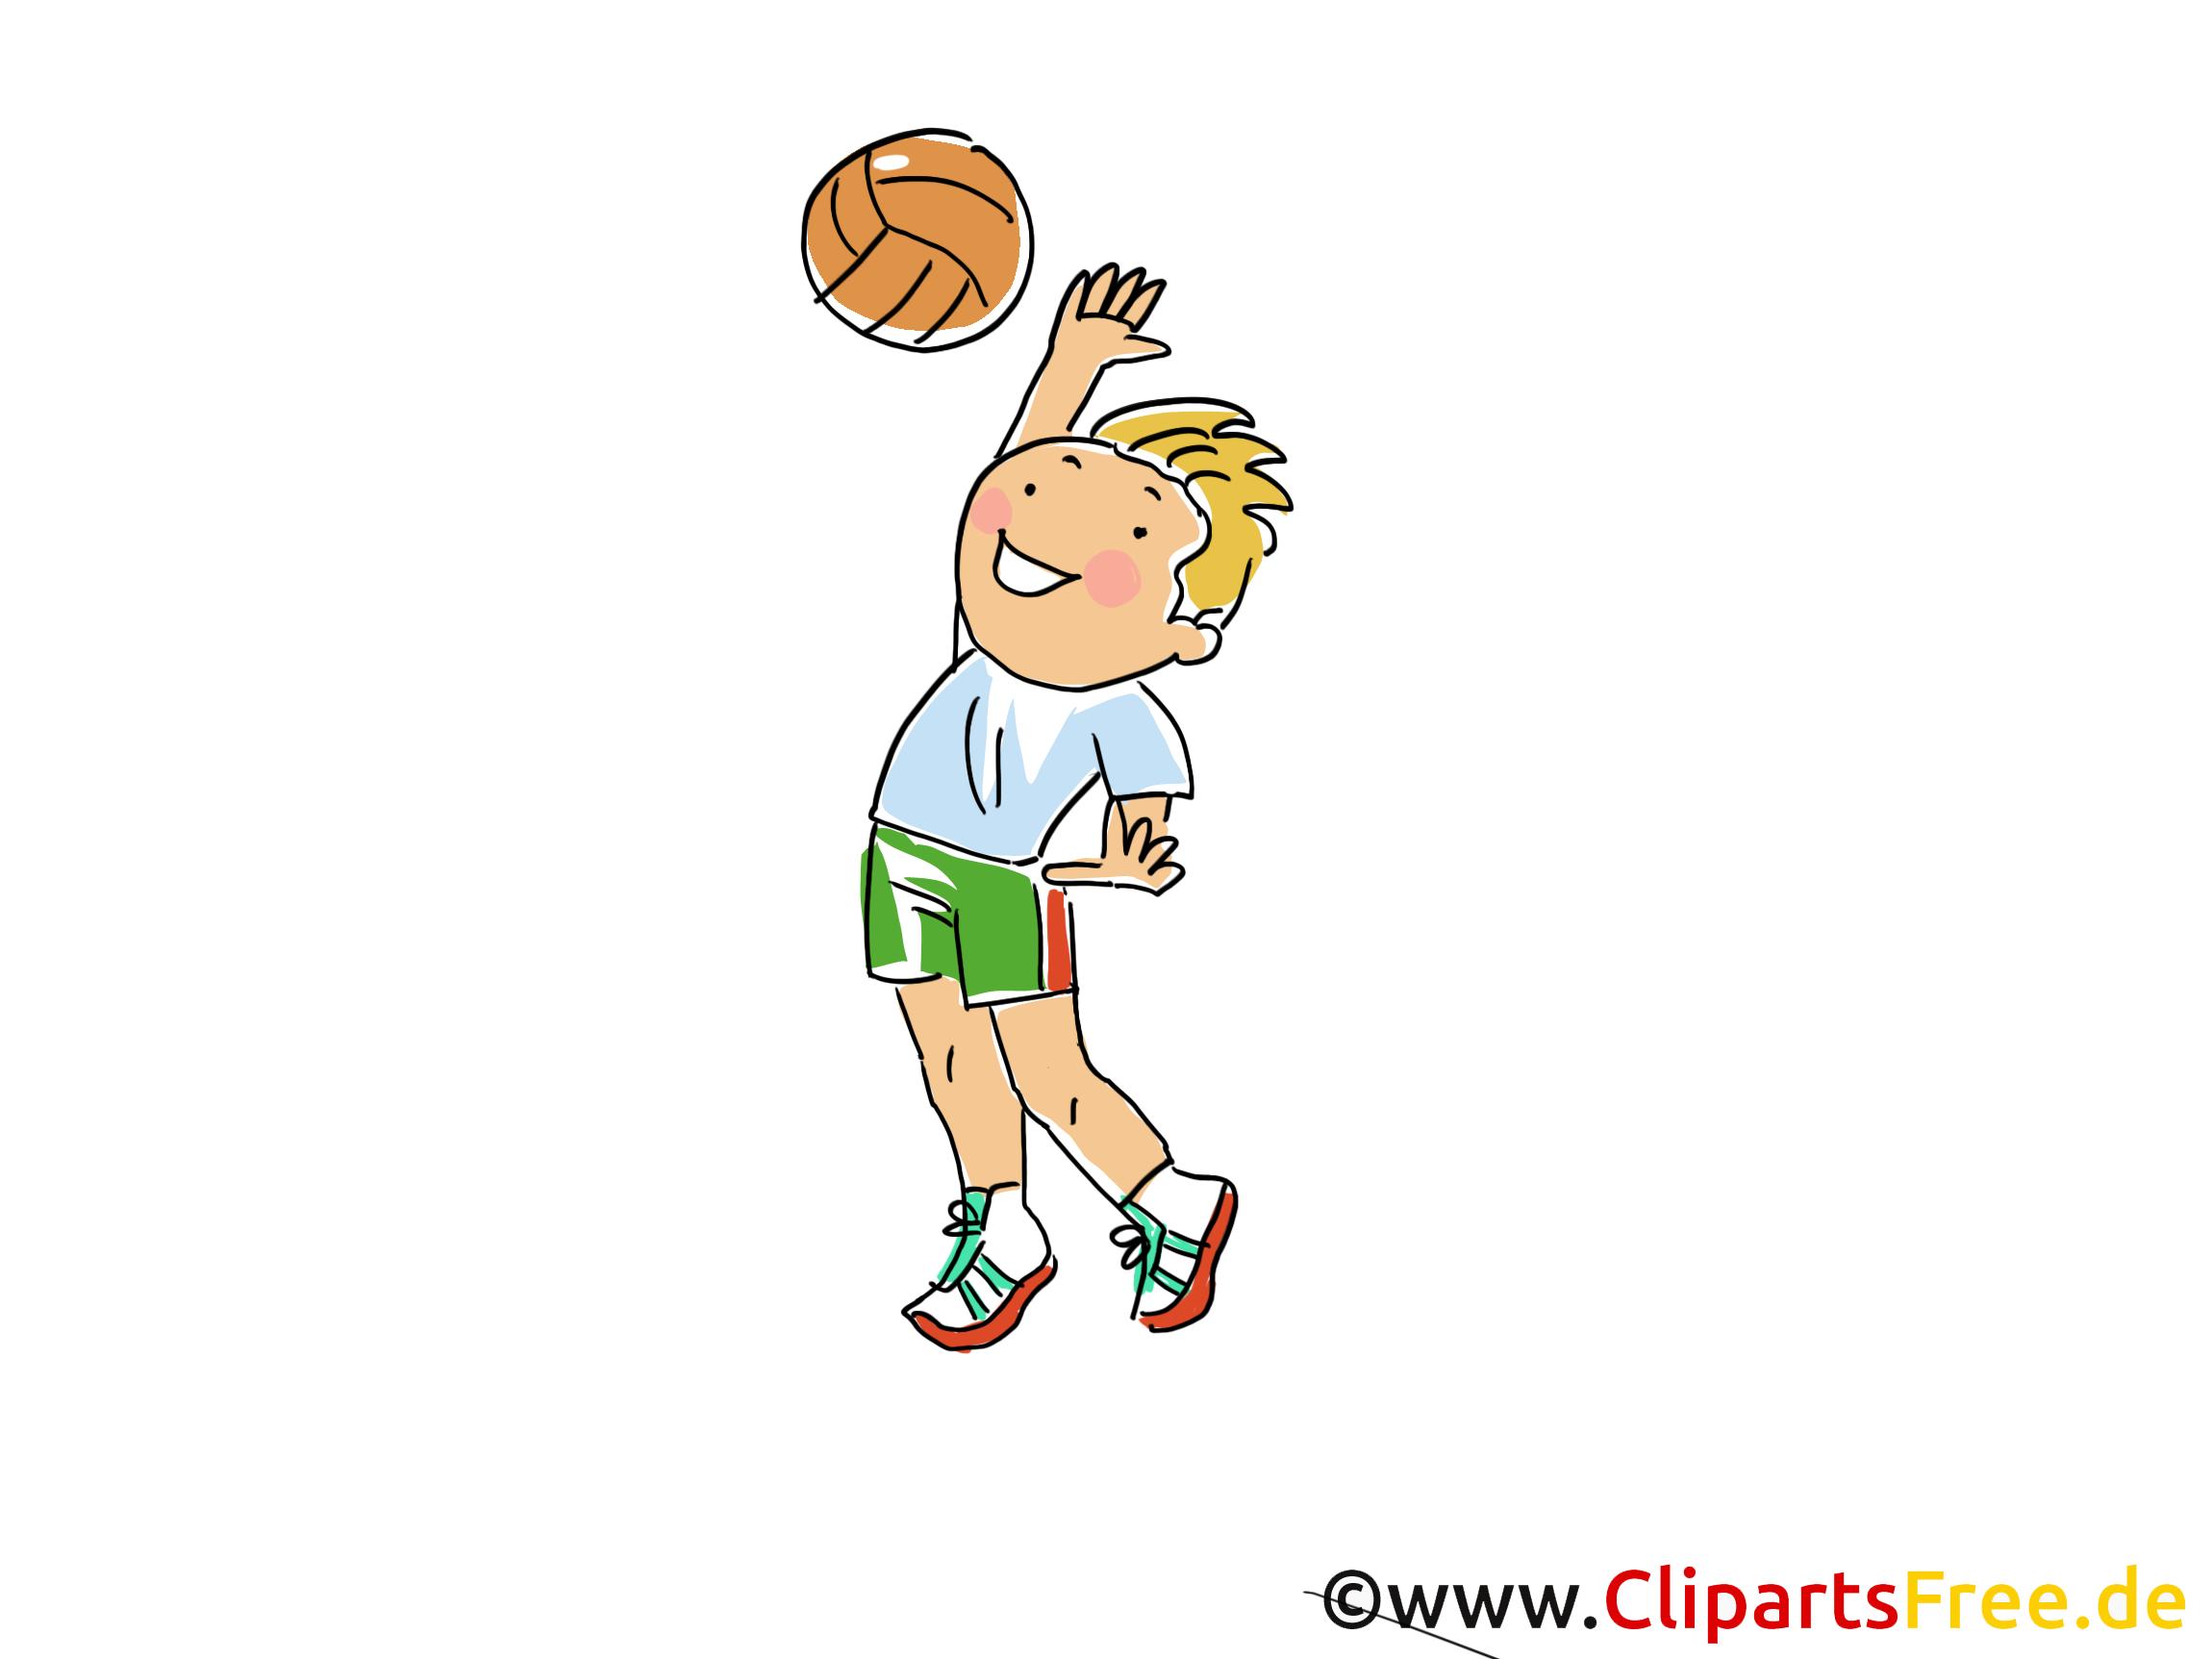 Clipart kostenlos sport graphic freeuse library Sport Bilder, Cliparts, Cartoons, Grafiken, Illustrationen, Gifs ... graphic freeuse library